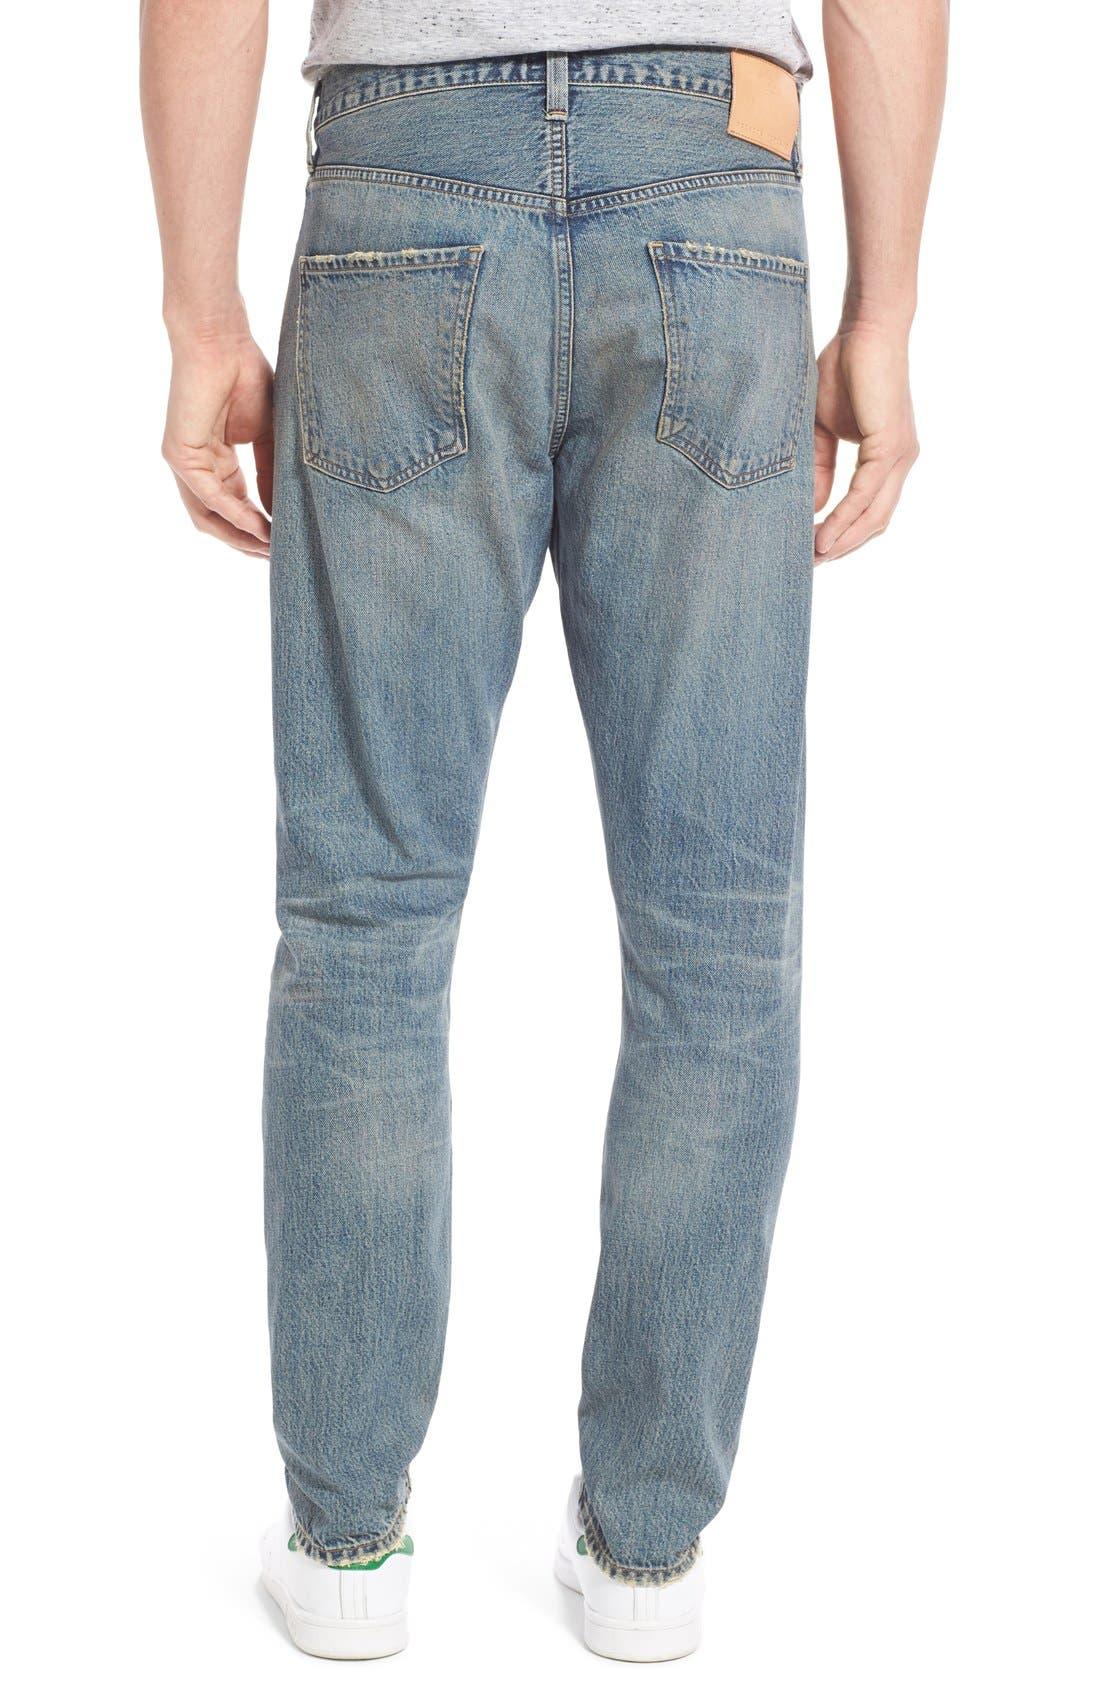 Rowan Slouchy Skinny Fit Jeans,                             Alternate thumbnail 2, color,                             462